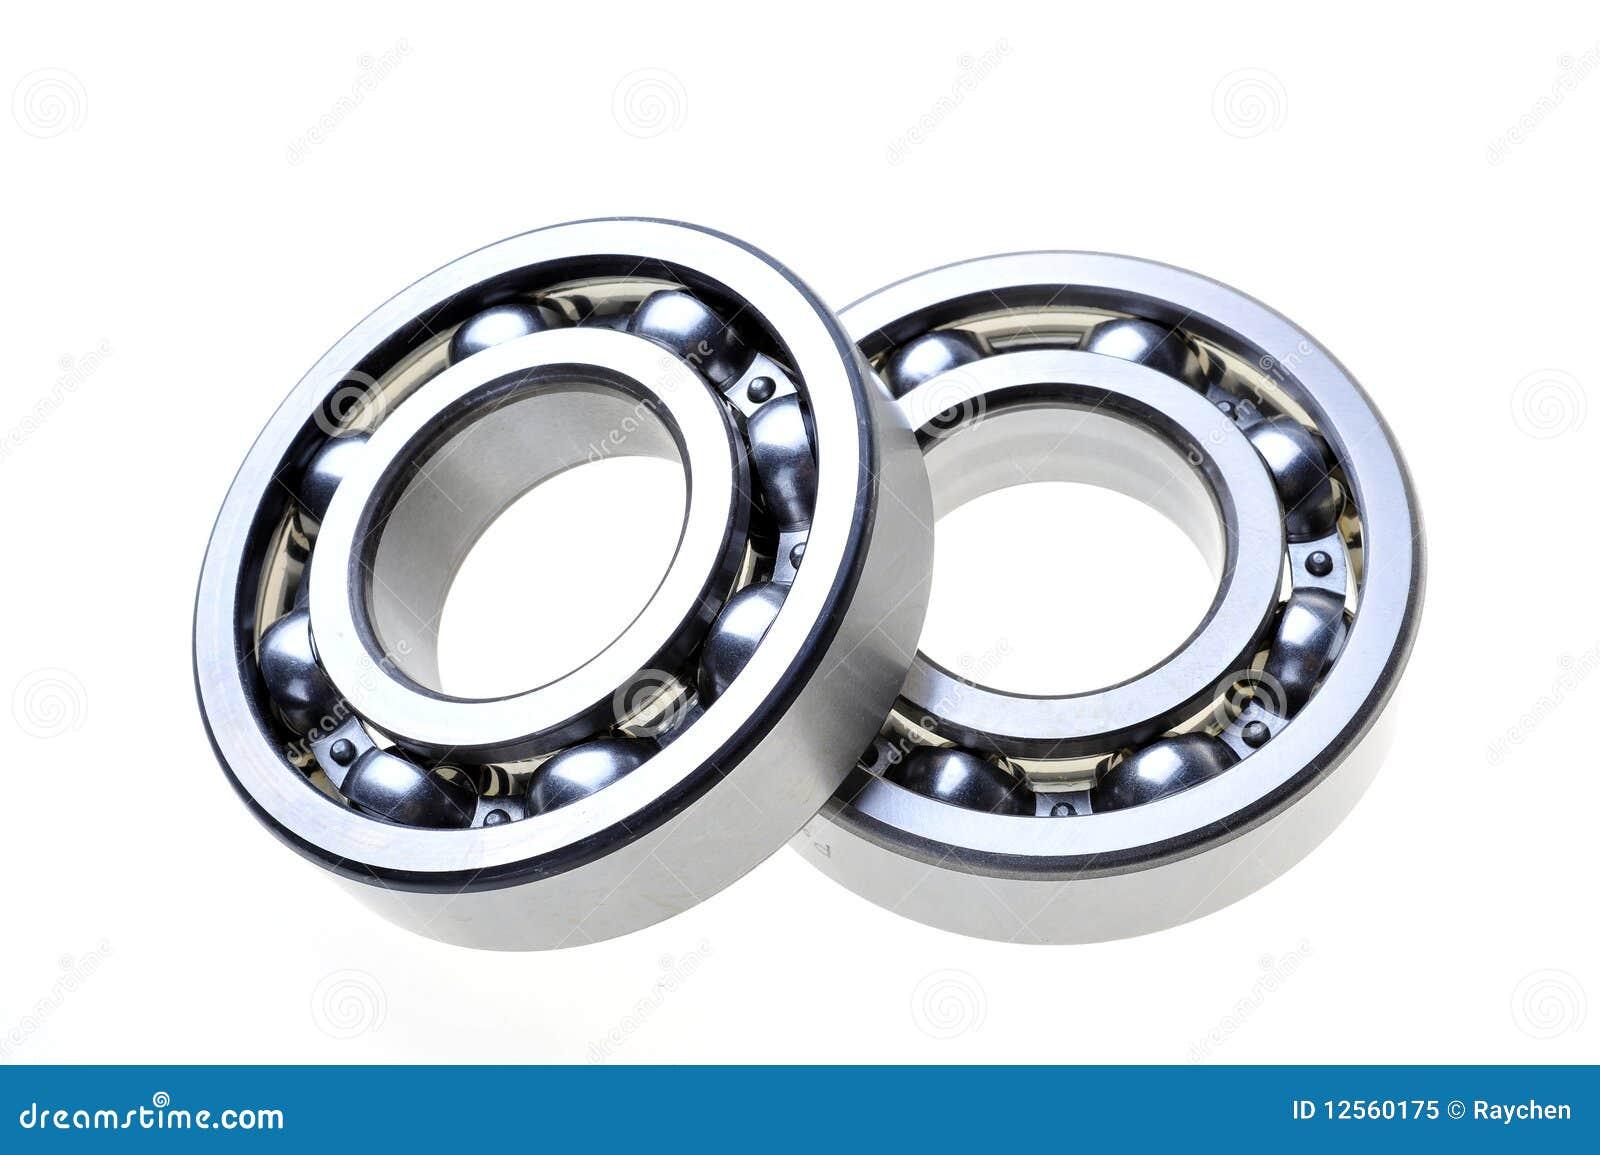 Two bearings